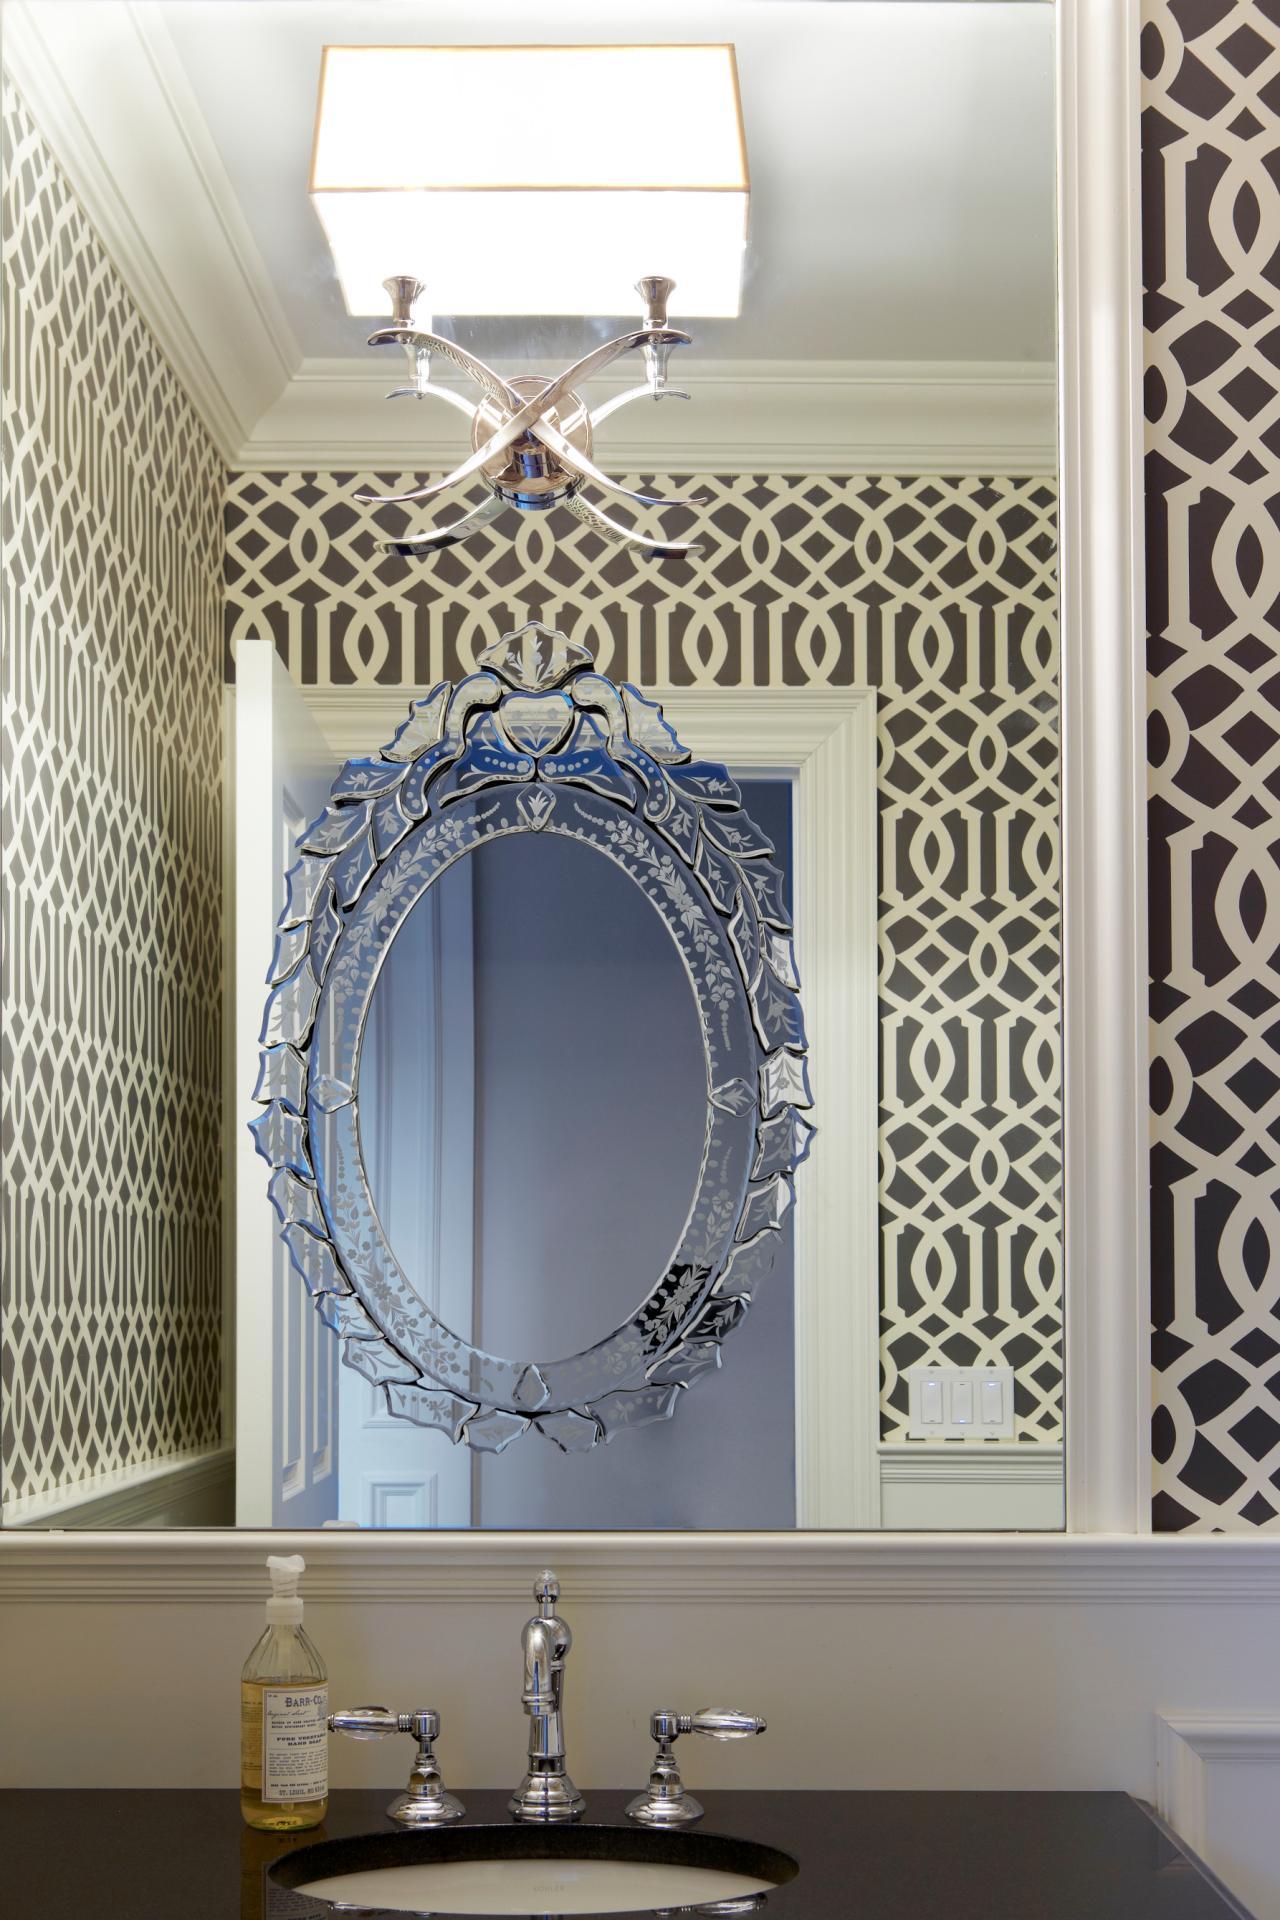 j73GMJ Hgtv Home Interior Design on hgtv room design, hgtv designers' portfolio, hgtv design portfolio 2013, hgtv kitchen design,